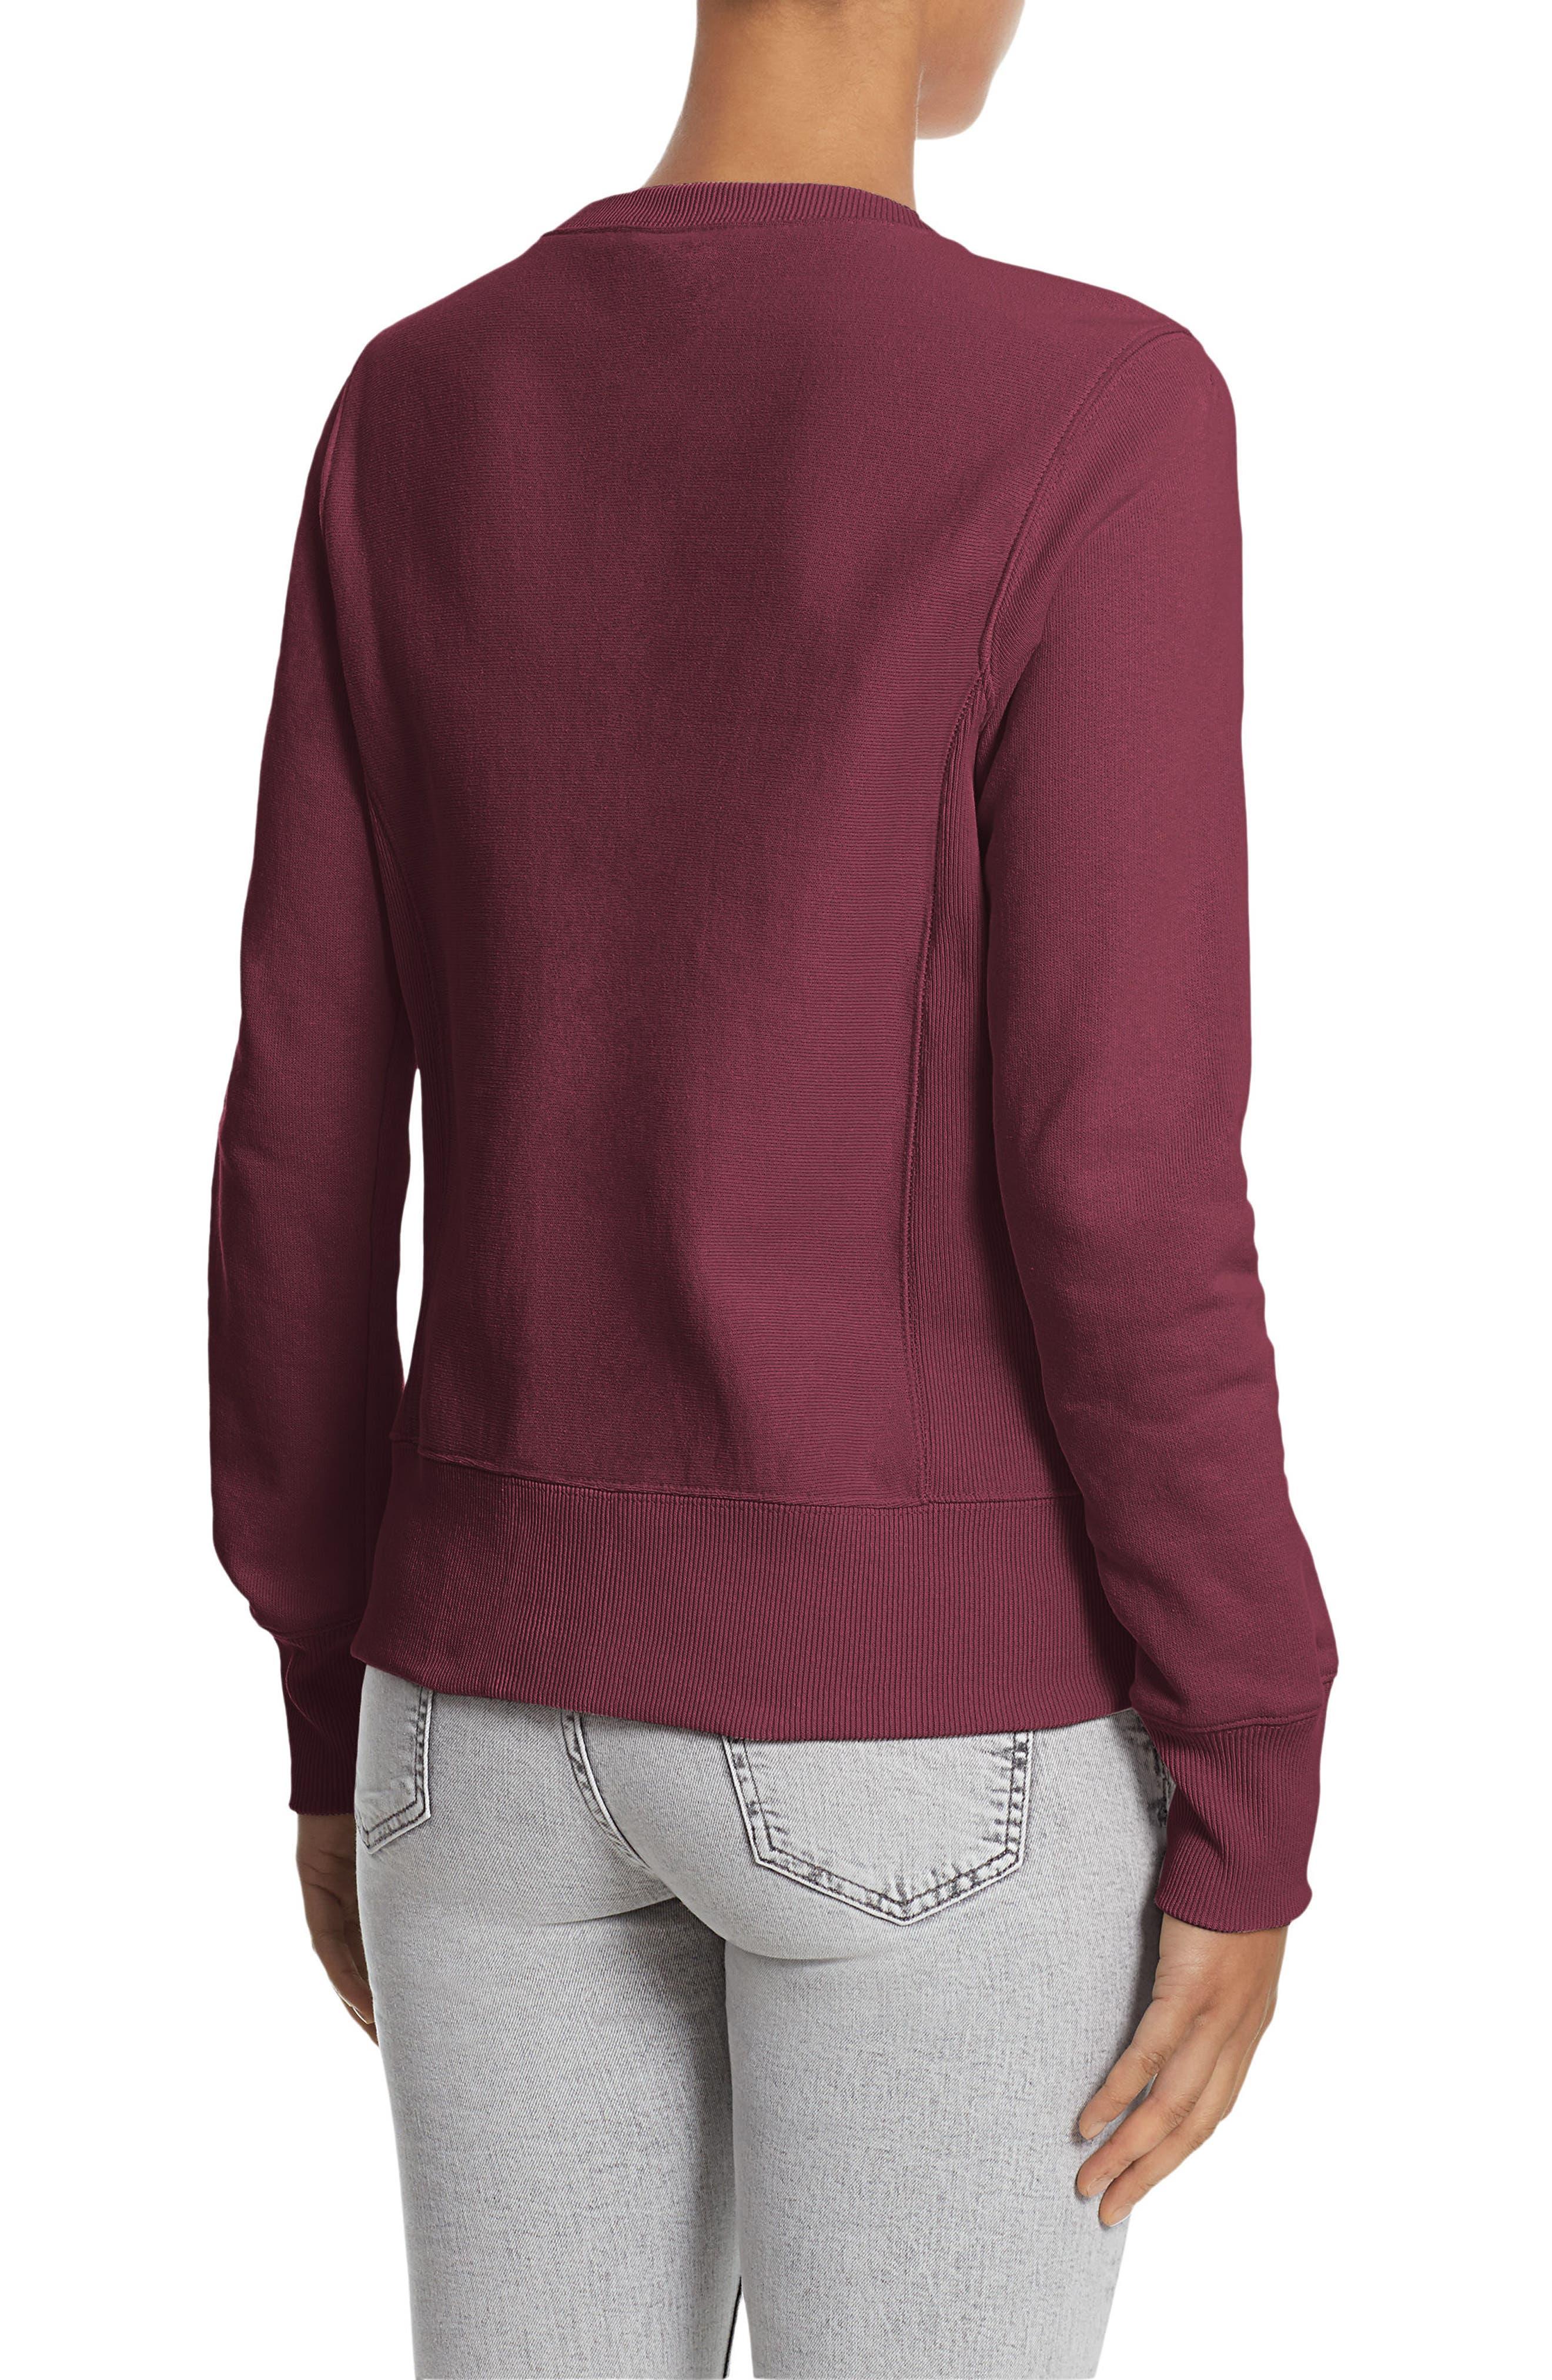 Reverse Weave<sup>®</sup> French Terry Crewneck Sweatshirt,                             Alternate thumbnail 2, color,                             Bordeaux Red